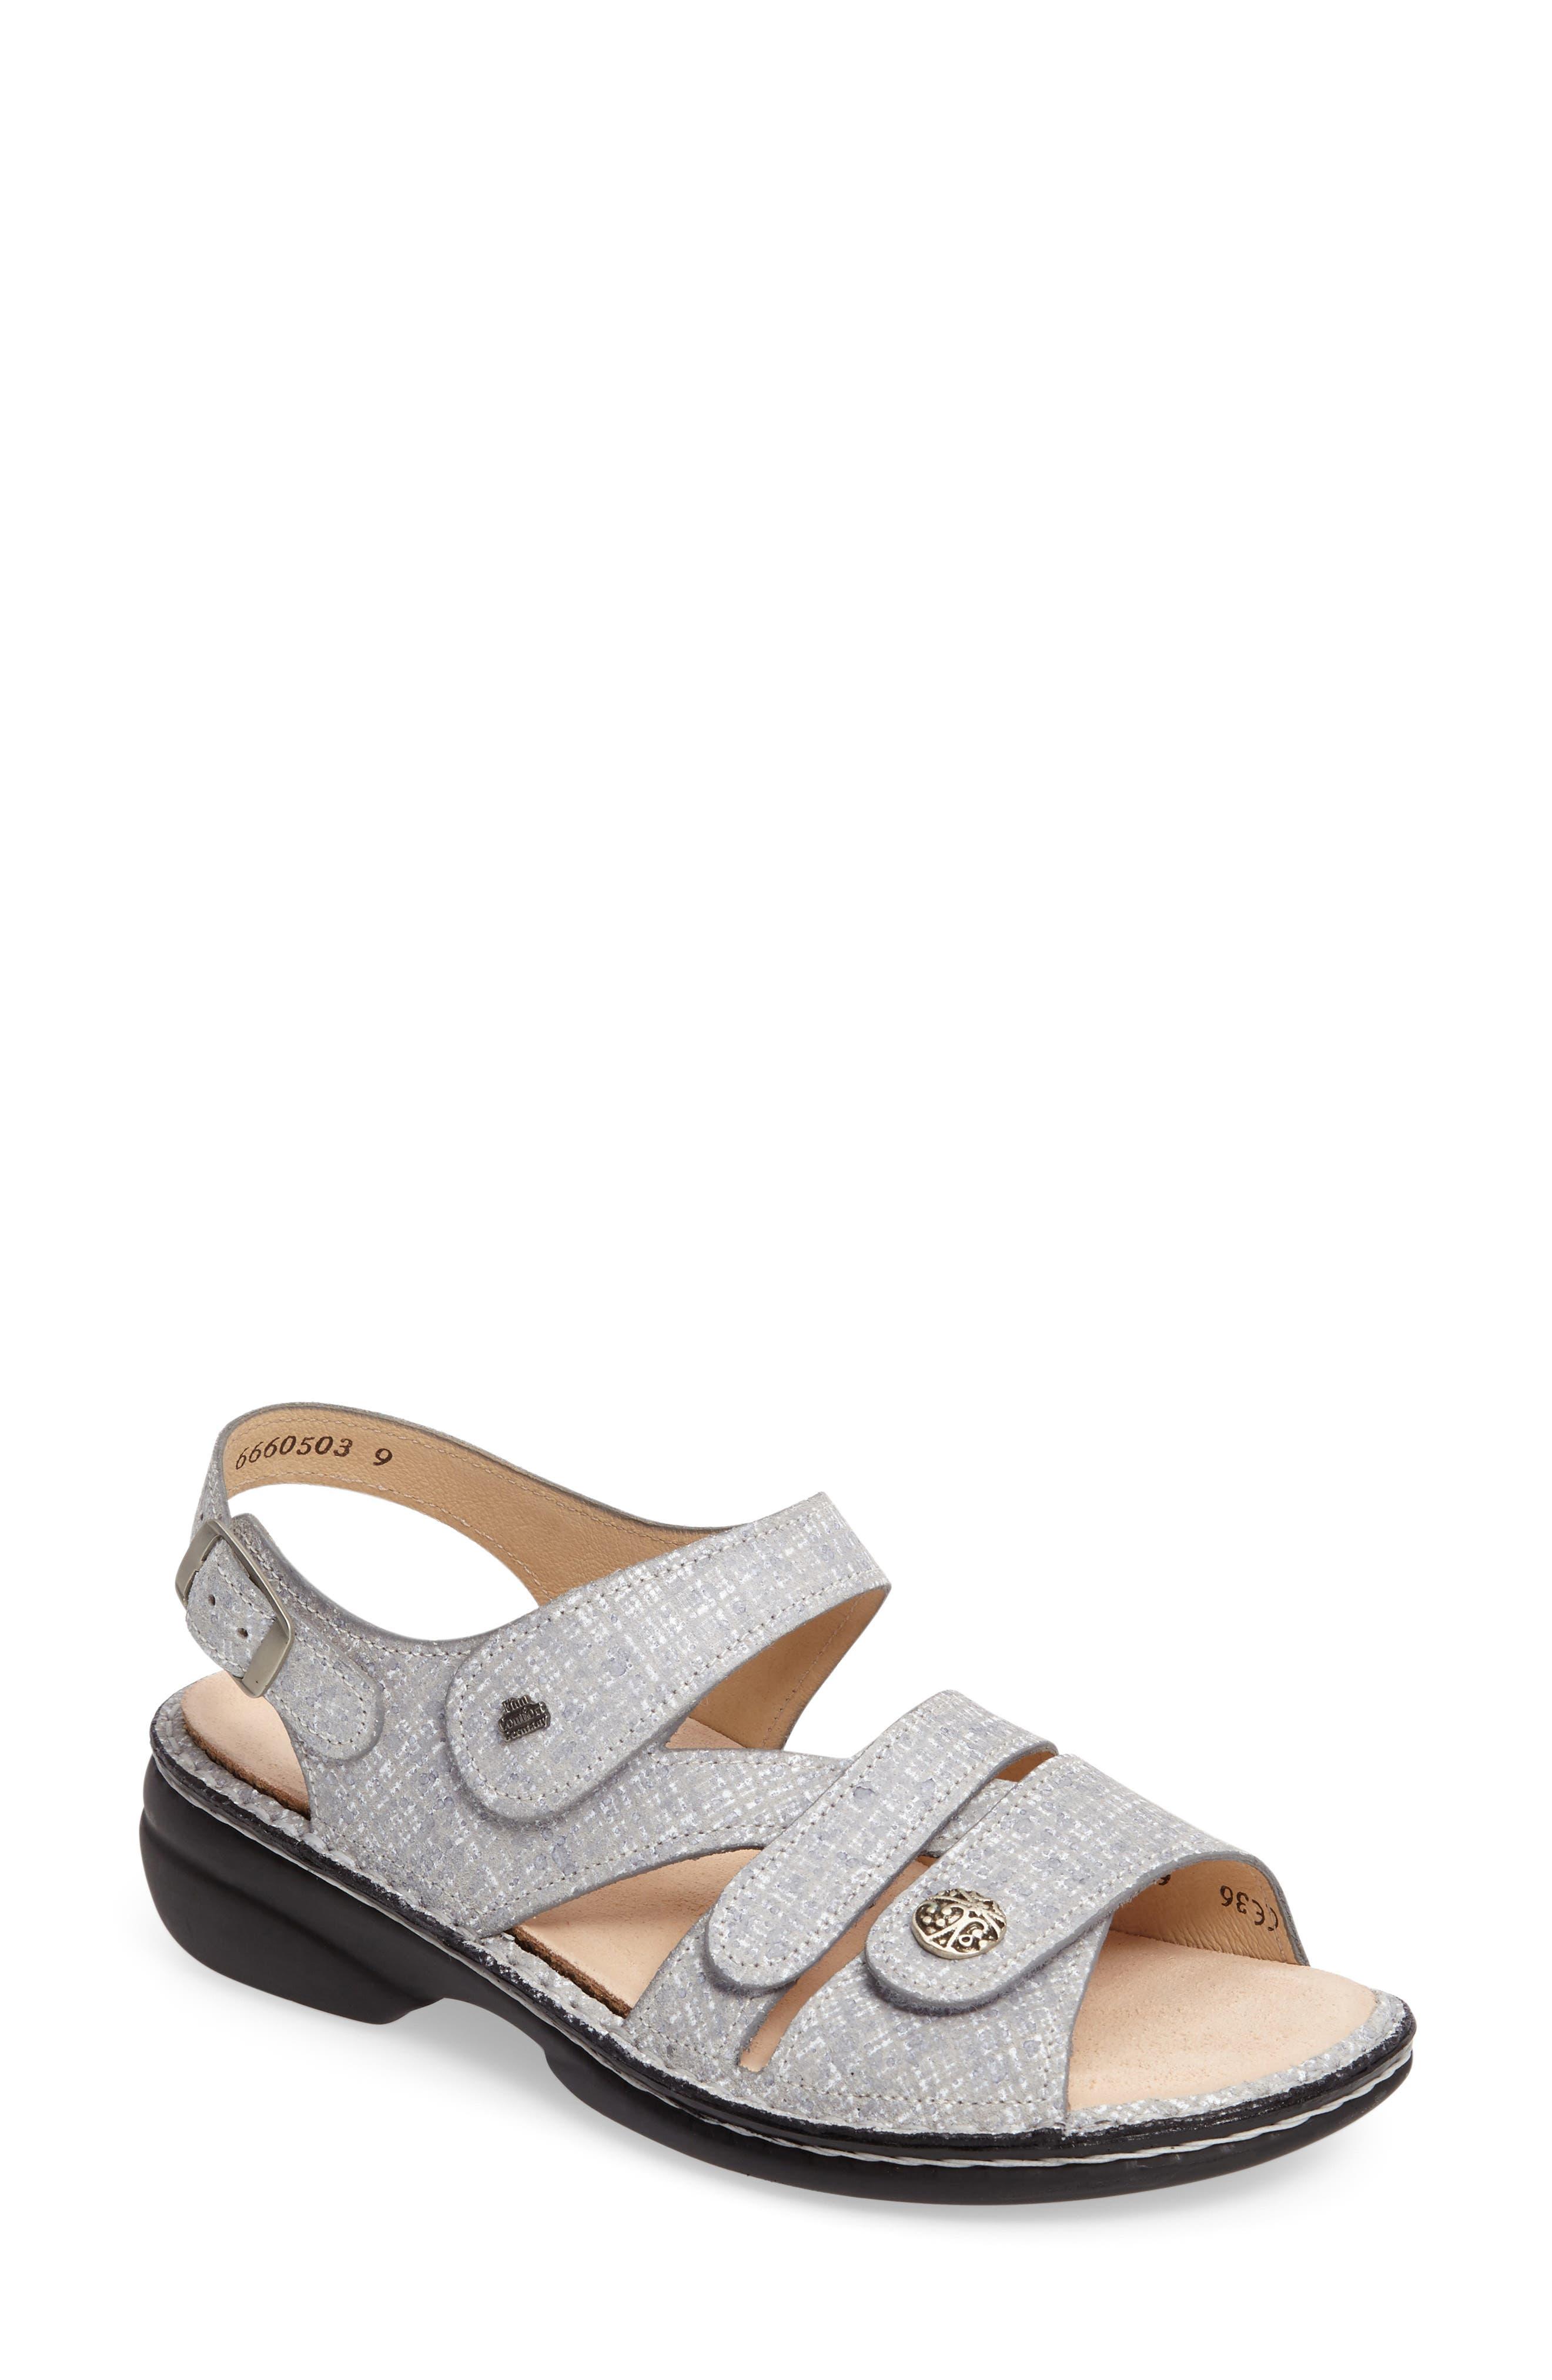 Alternate Image 1 Selected - Finn Comfort 'Gomera' Sandal